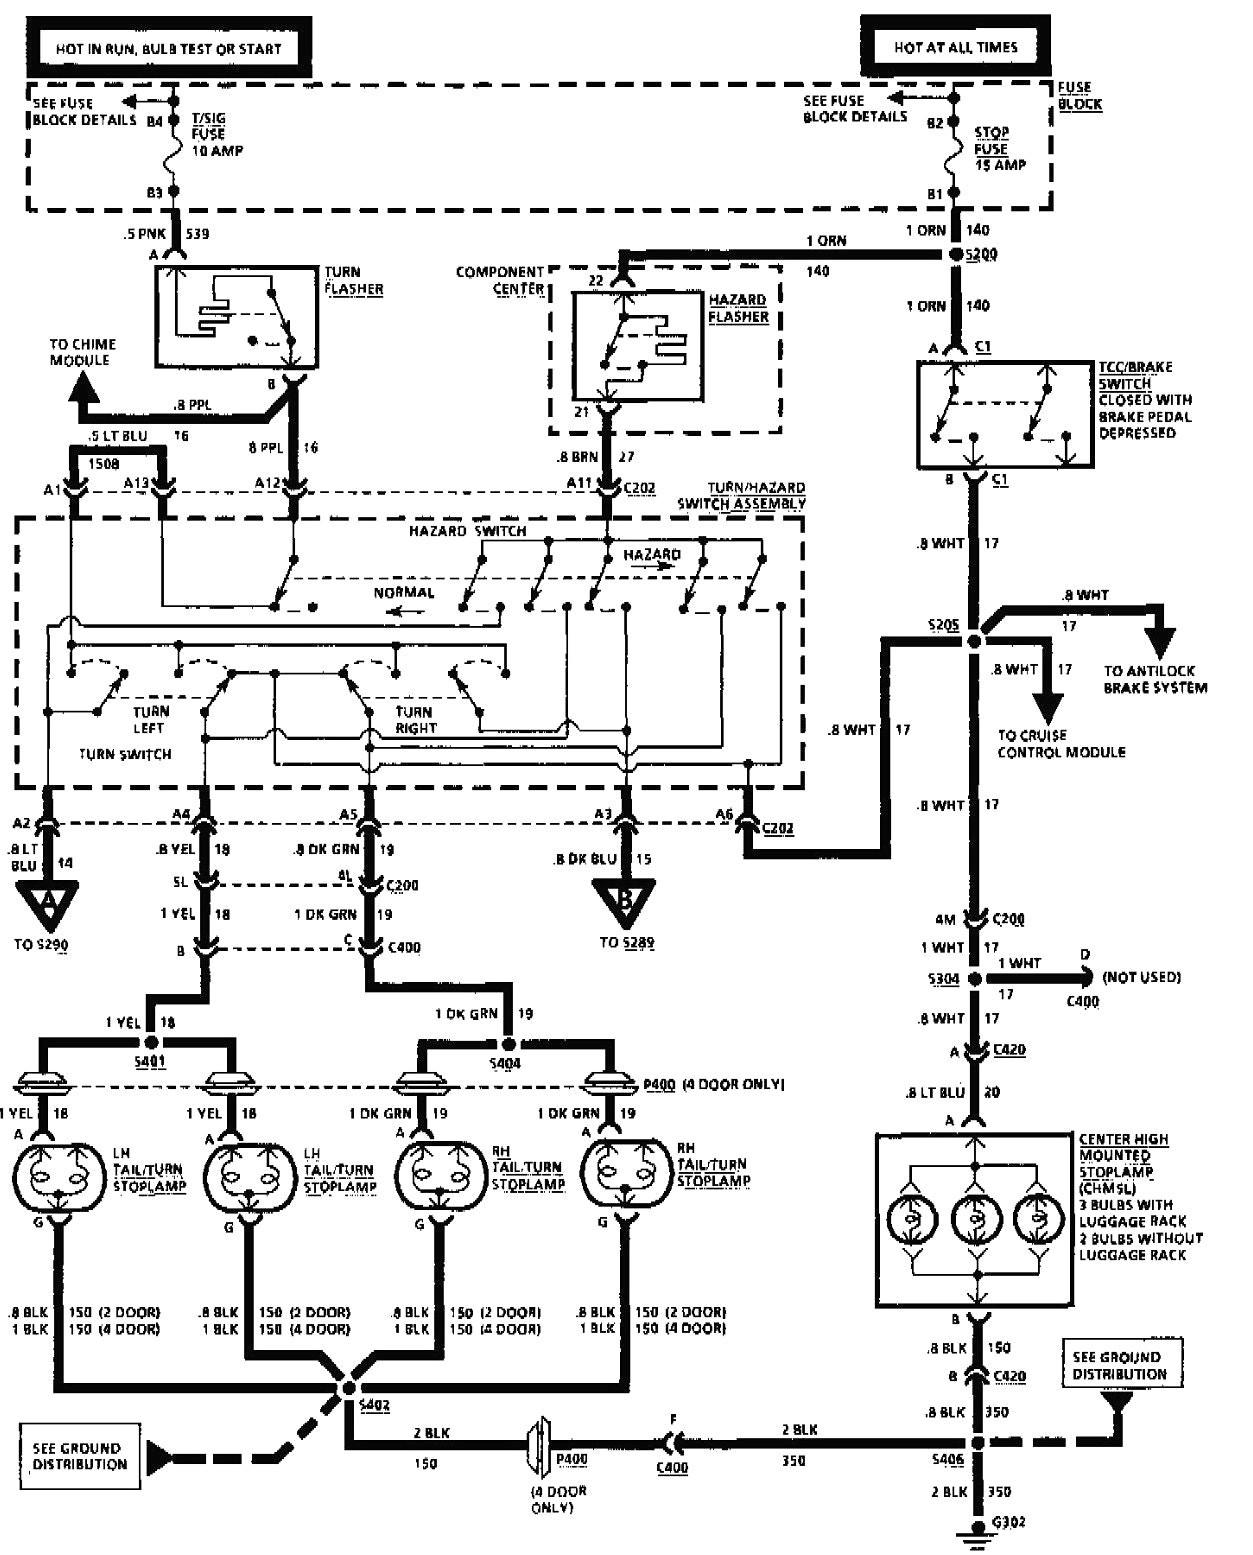 Third Brake Light Wiring Diagram Unique | Wiring Diagram Image